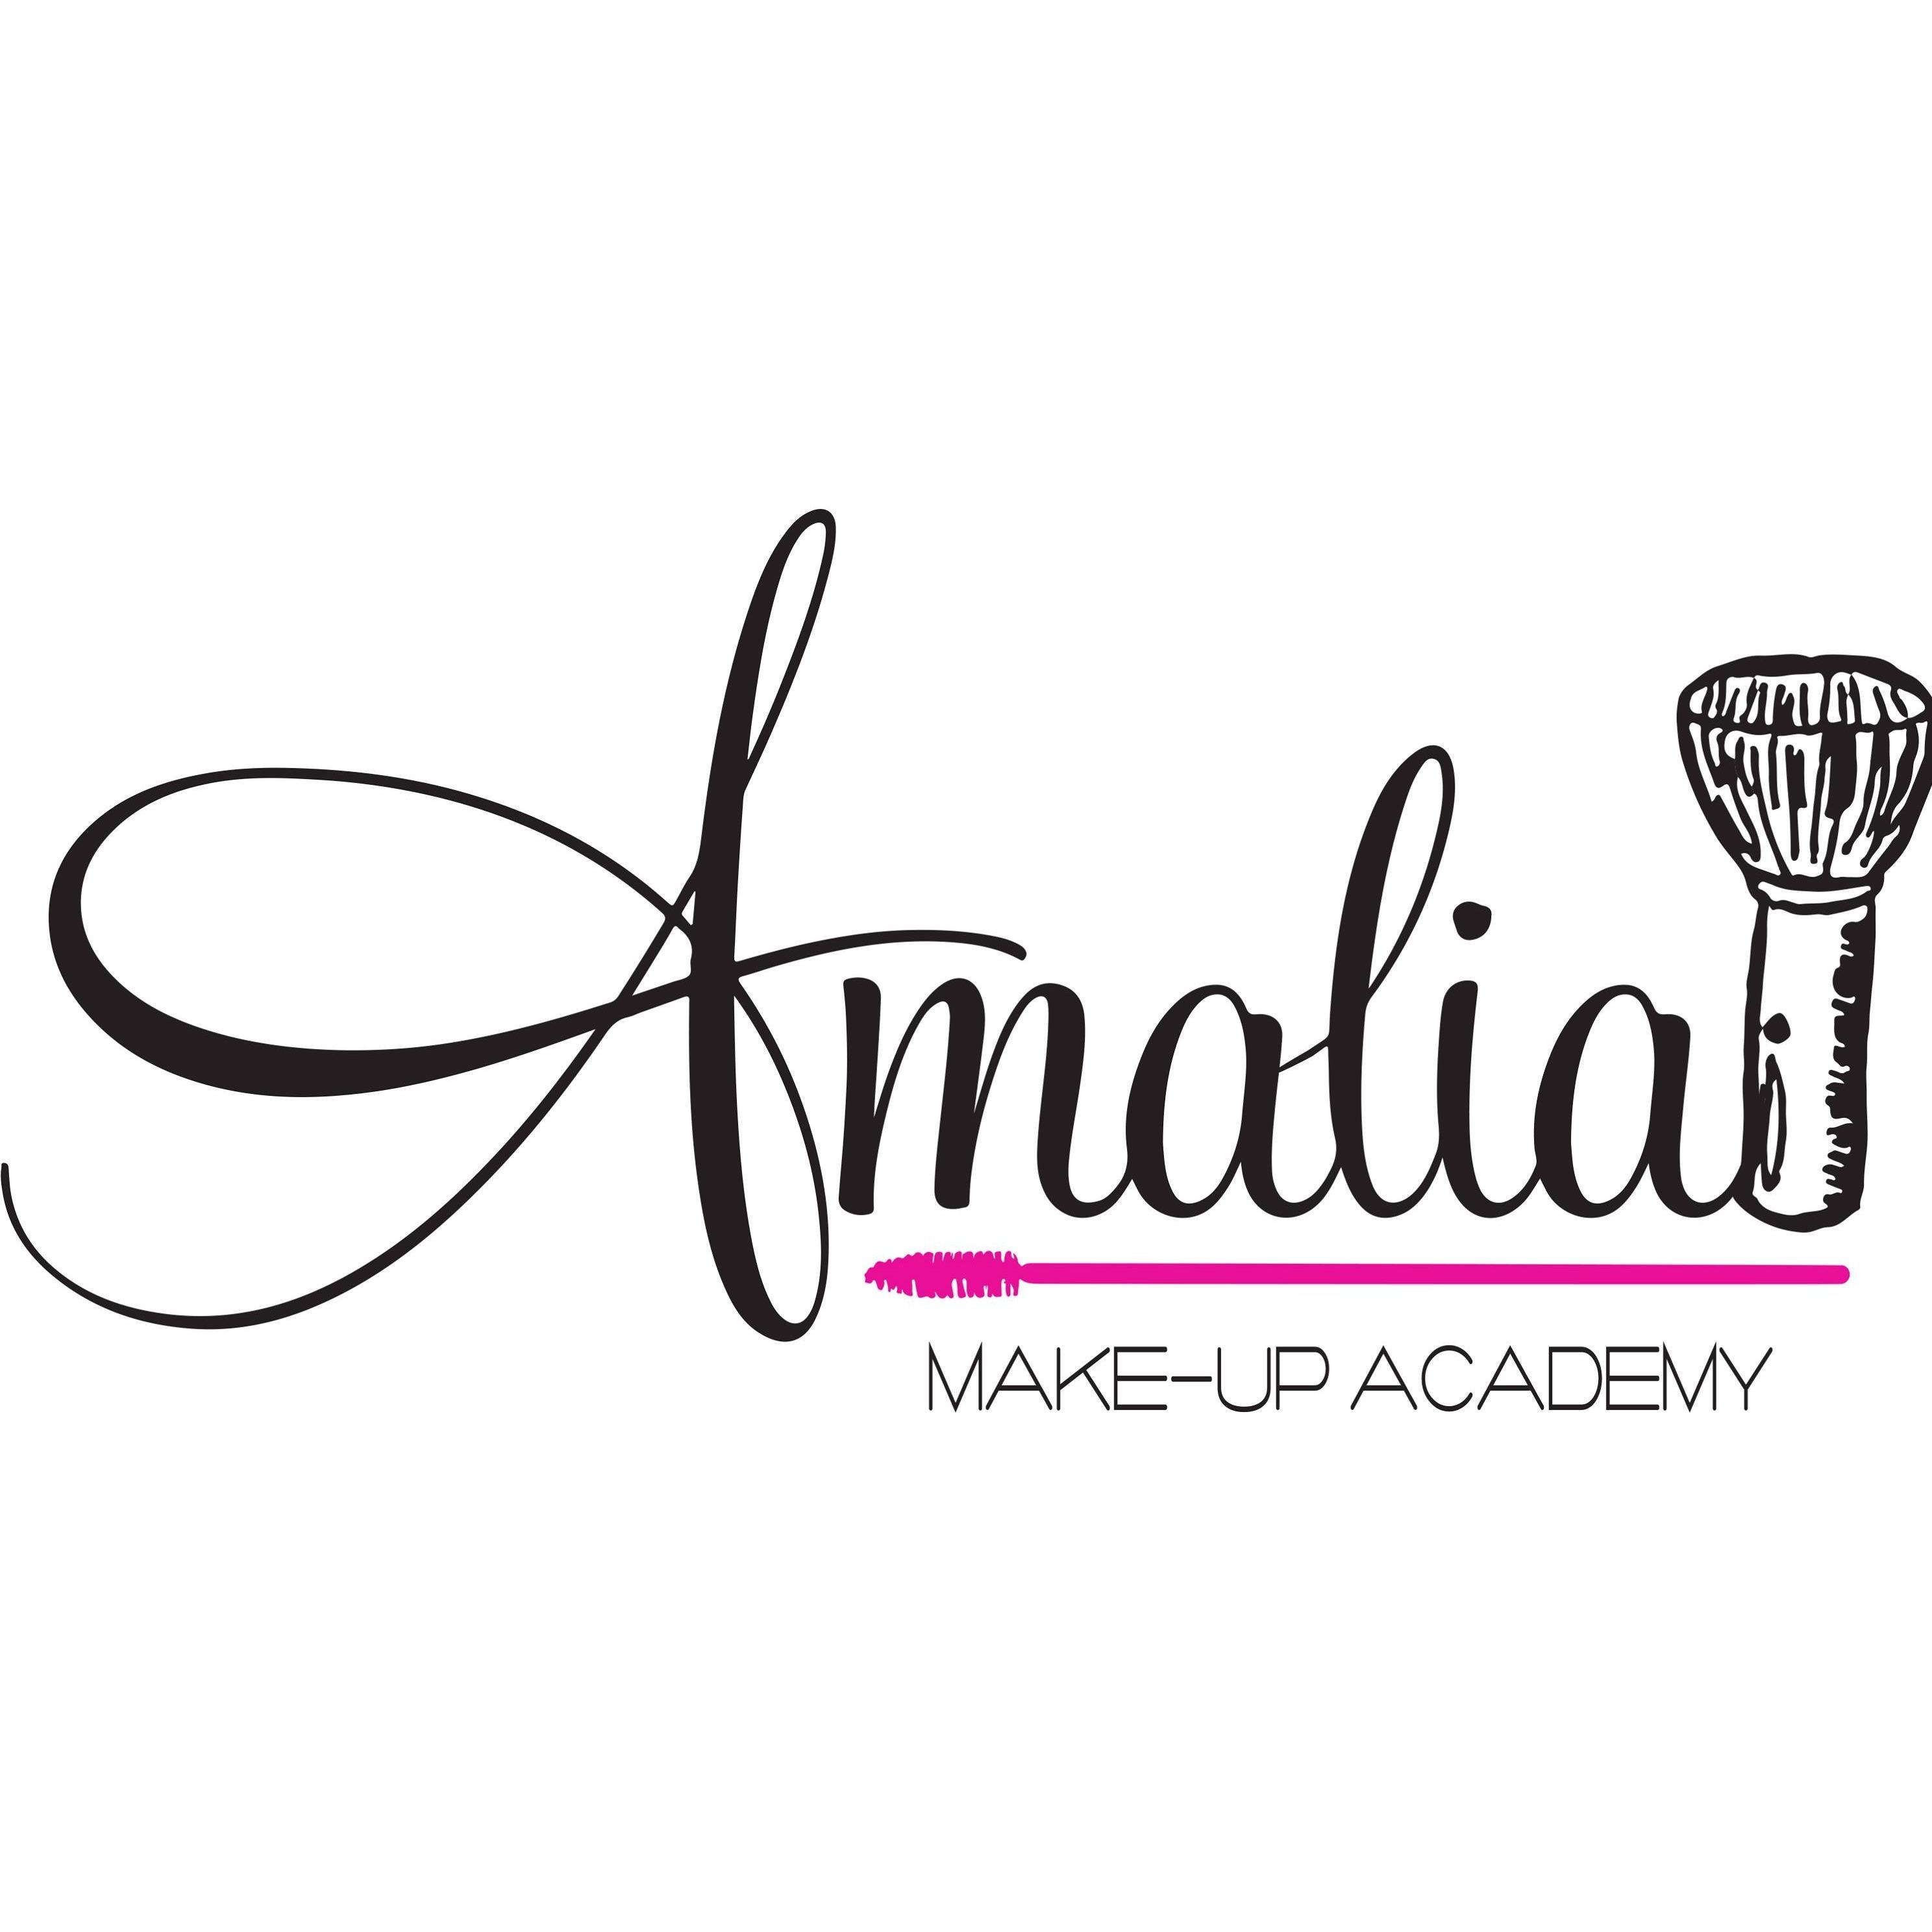 Amalia Make-Up Academy - Tucson, AR 85713 - (520)519-9755 | ShowMeLocal.com